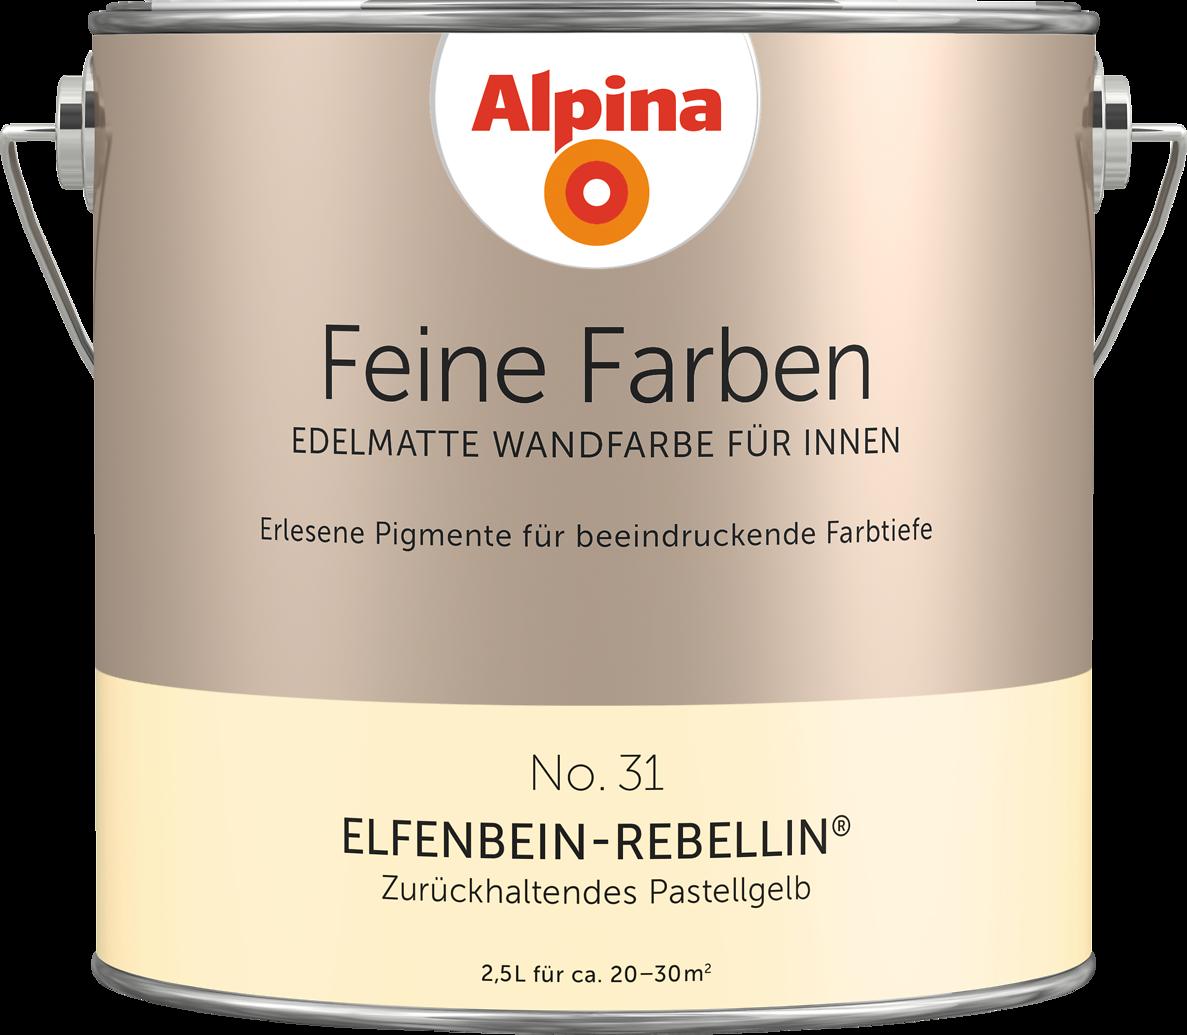 Premium-wandfarbe. Gelb, Pastellgelb: Alpina Feine Farben ... Gelb Grn Wandfarbe